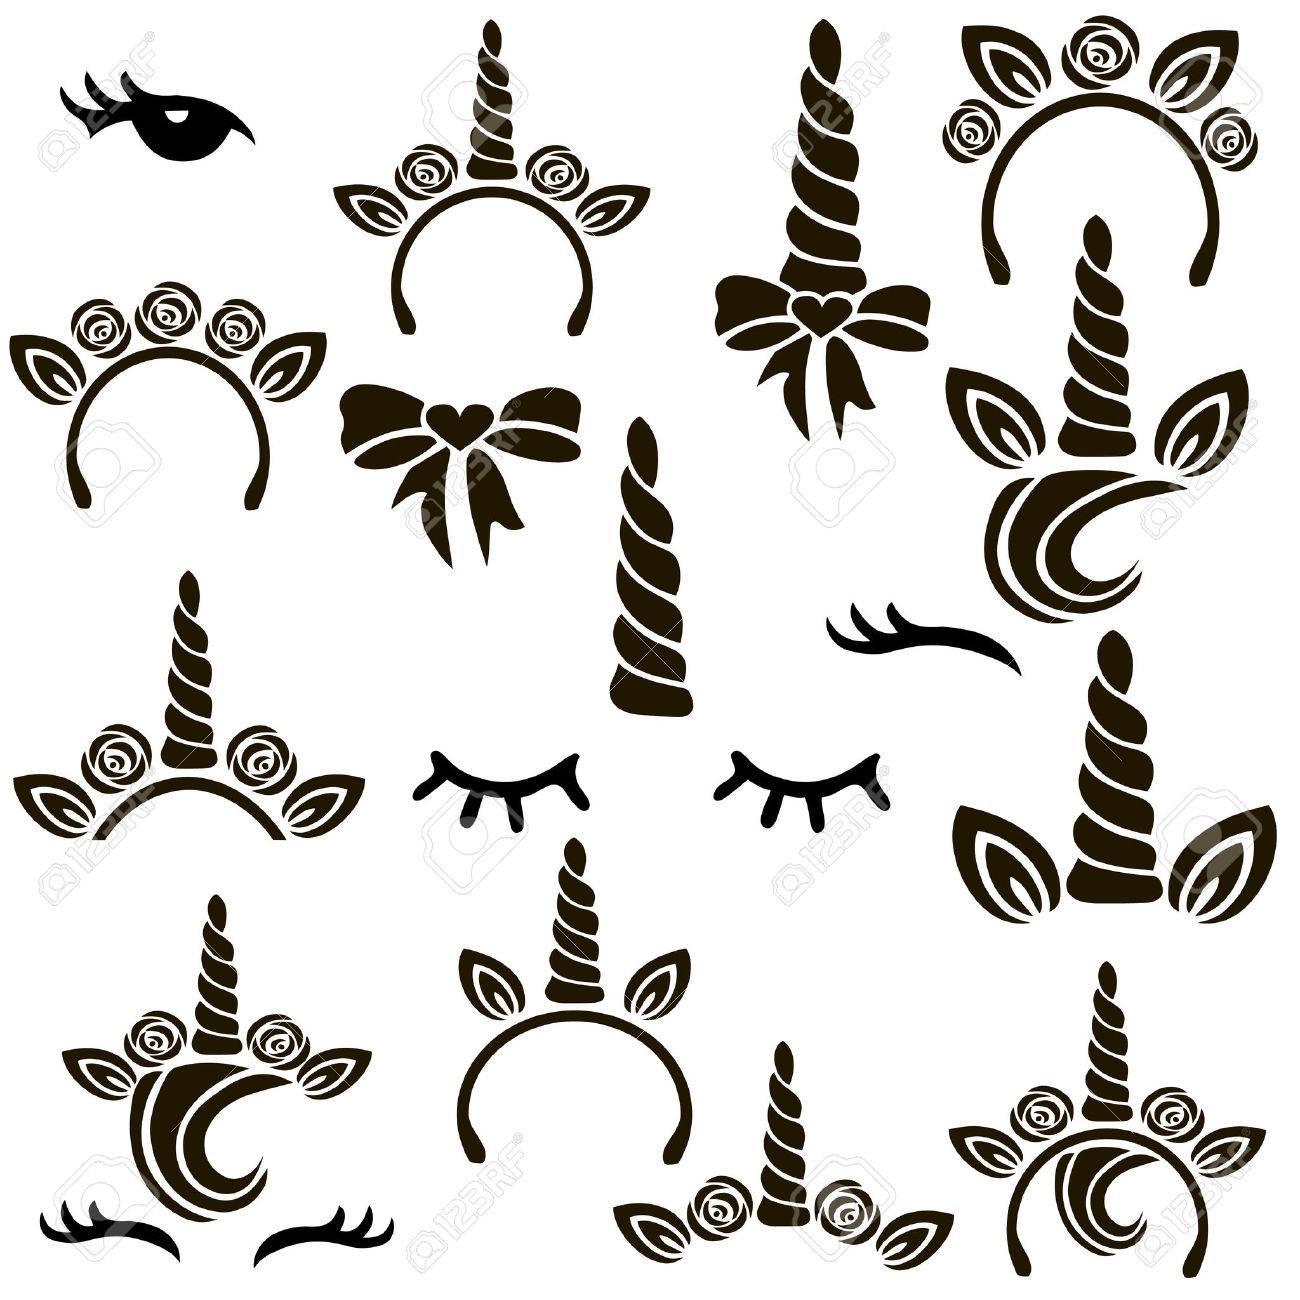 Unicorn symbols vector set. - 82081955